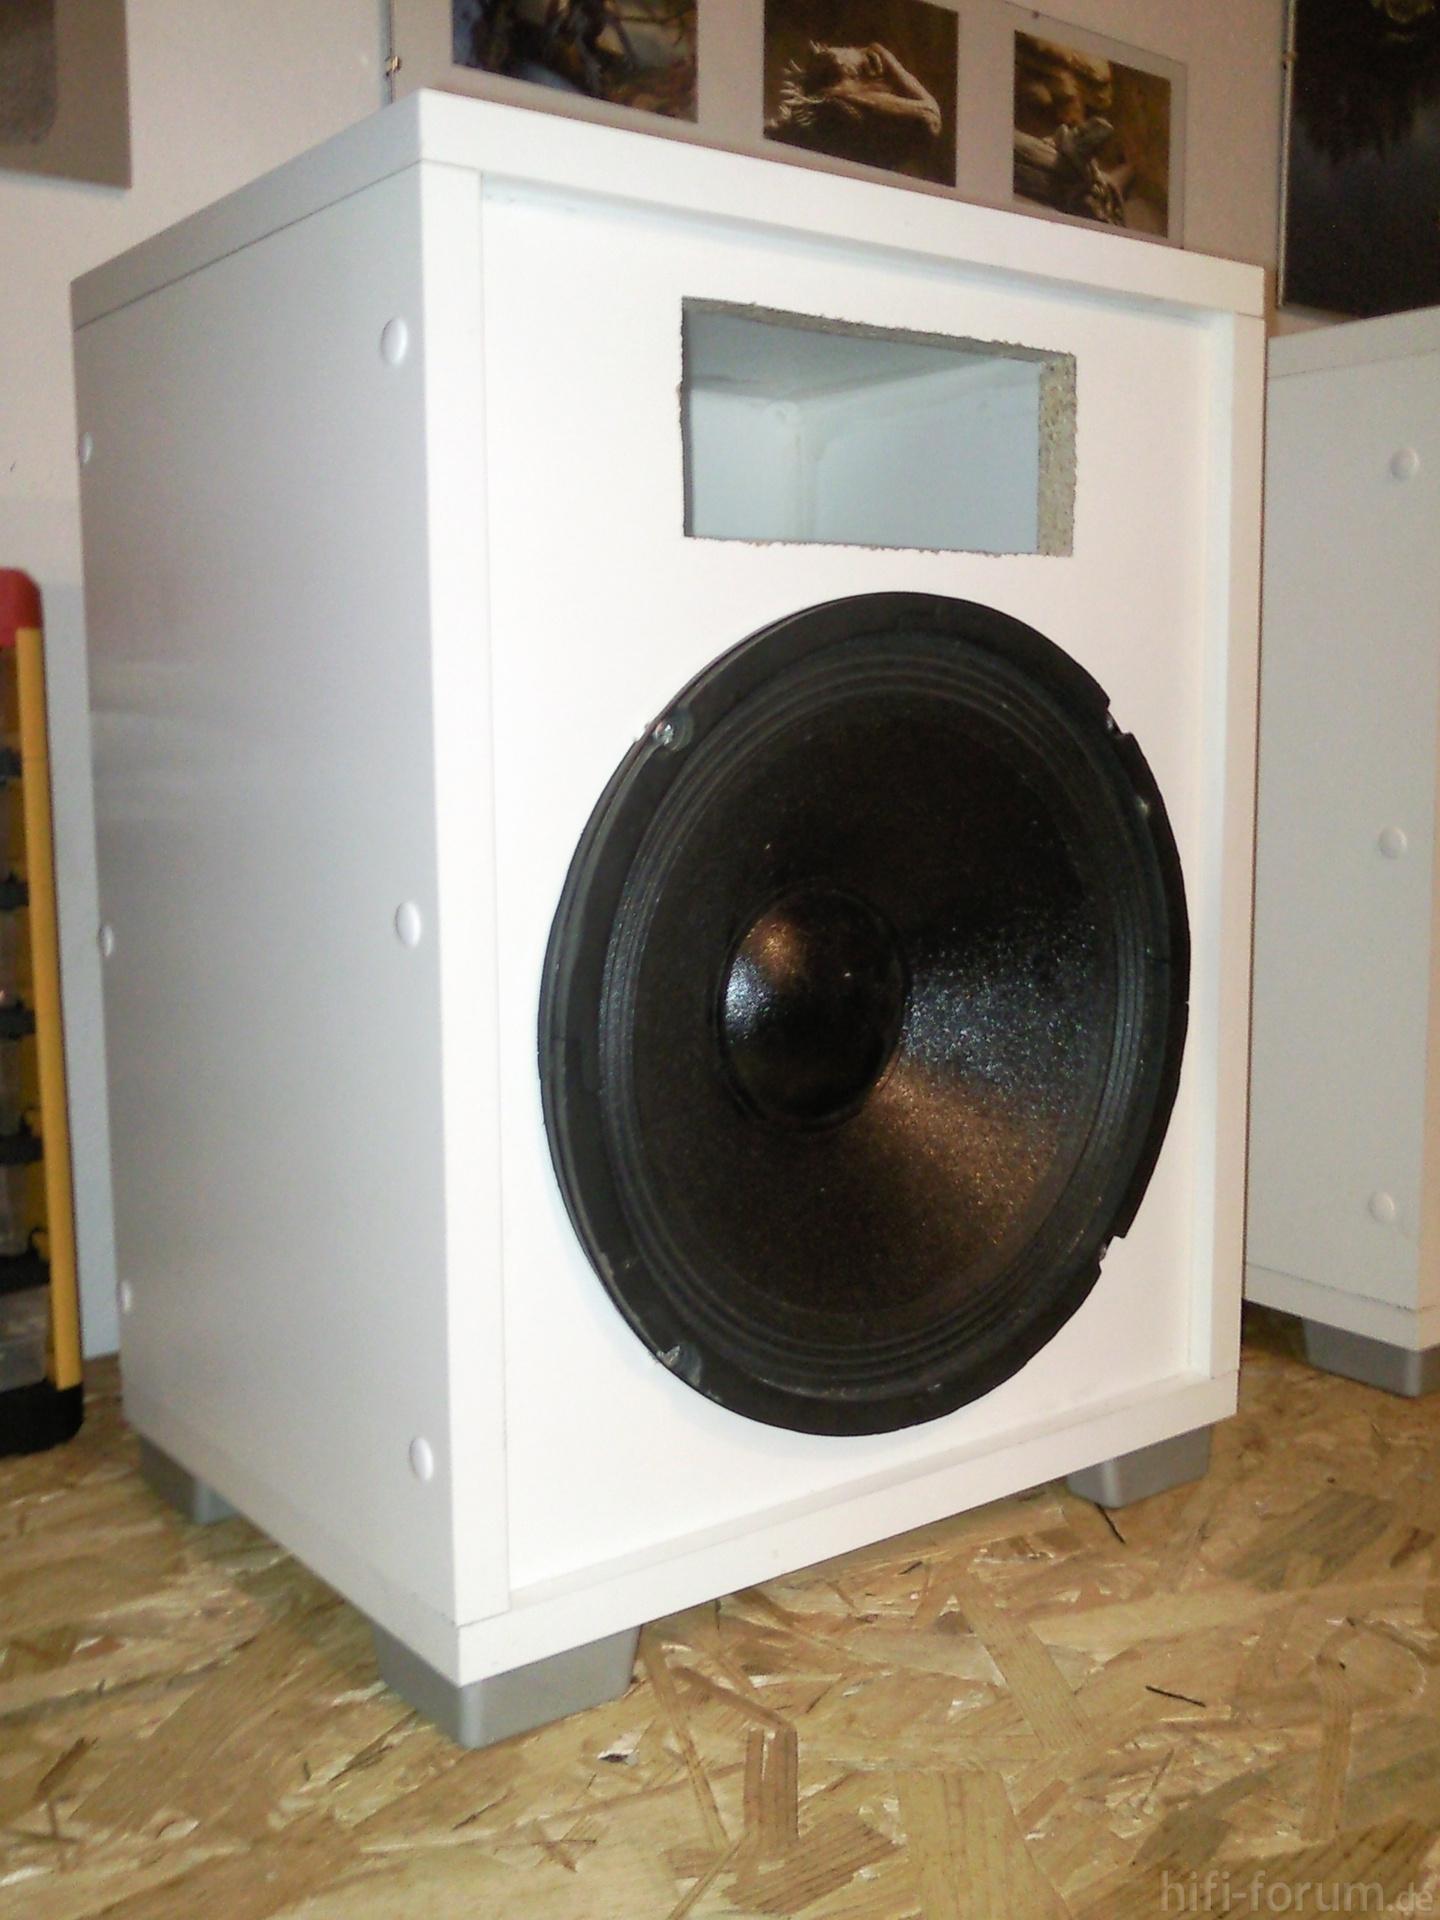 lautsprecher 2 lautsprecher hifi bildergalerie. Black Bedroom Furniture Sets. Home Design Ideas